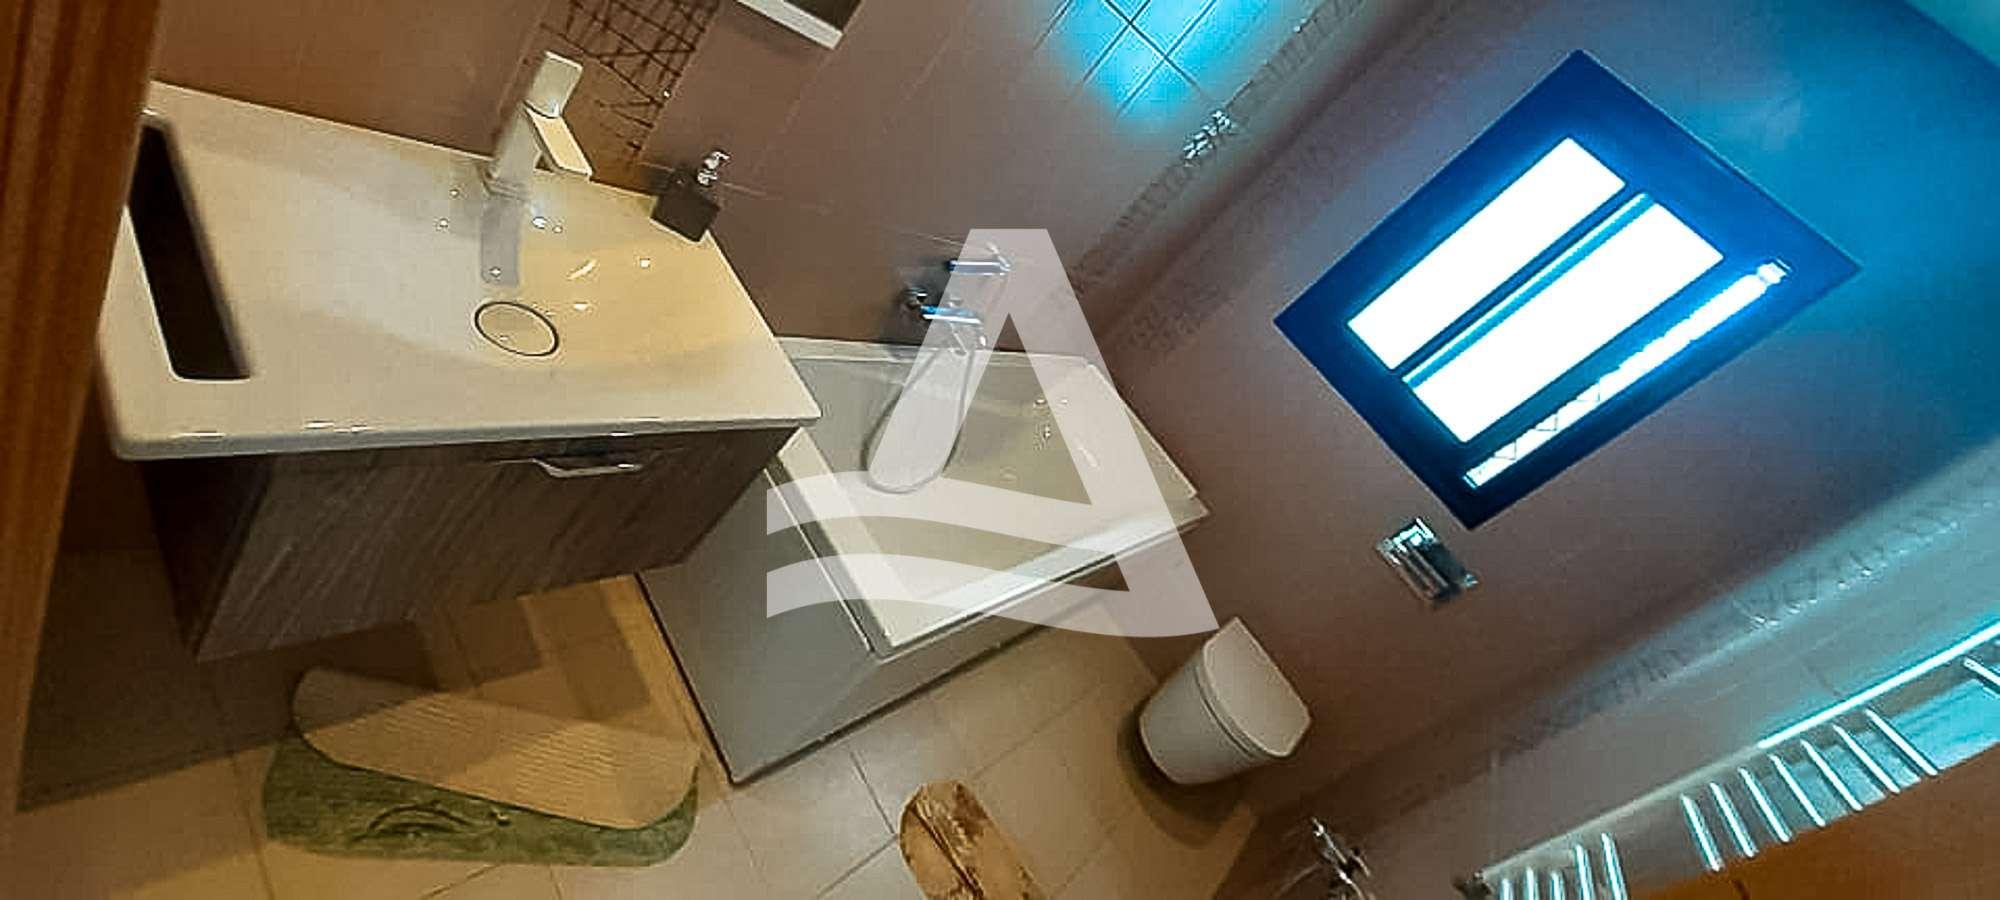 httpss3.amazonaws.comlogimoaws_Arcane_immobilière_la_Marsa-_location_-_vente_la_marsa_13_sur_21_1574354370830-1